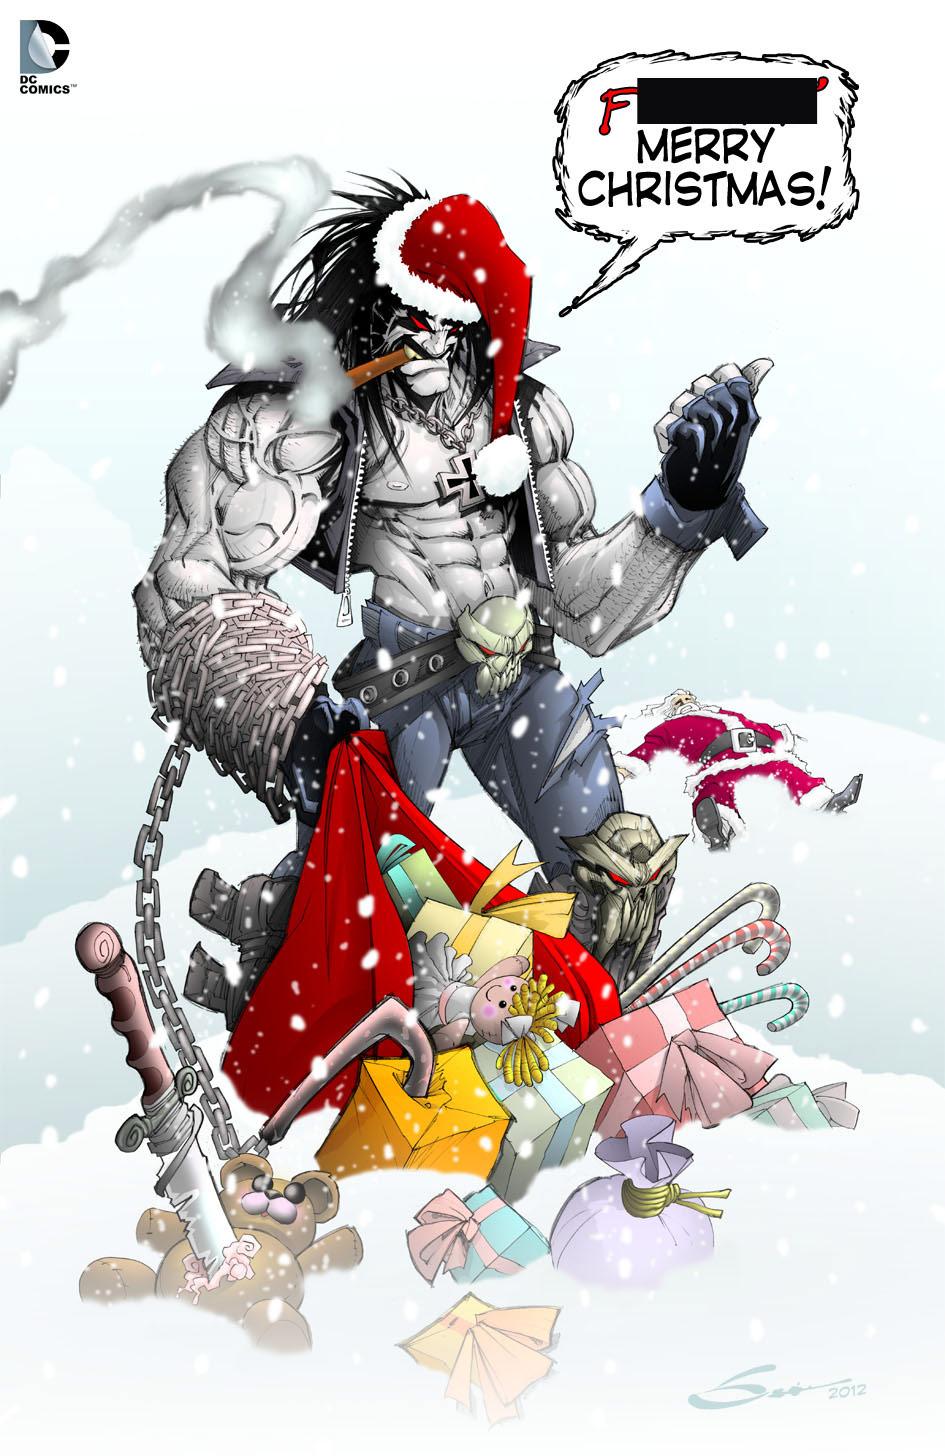 Christmas cosplay and artwork gallery image #7